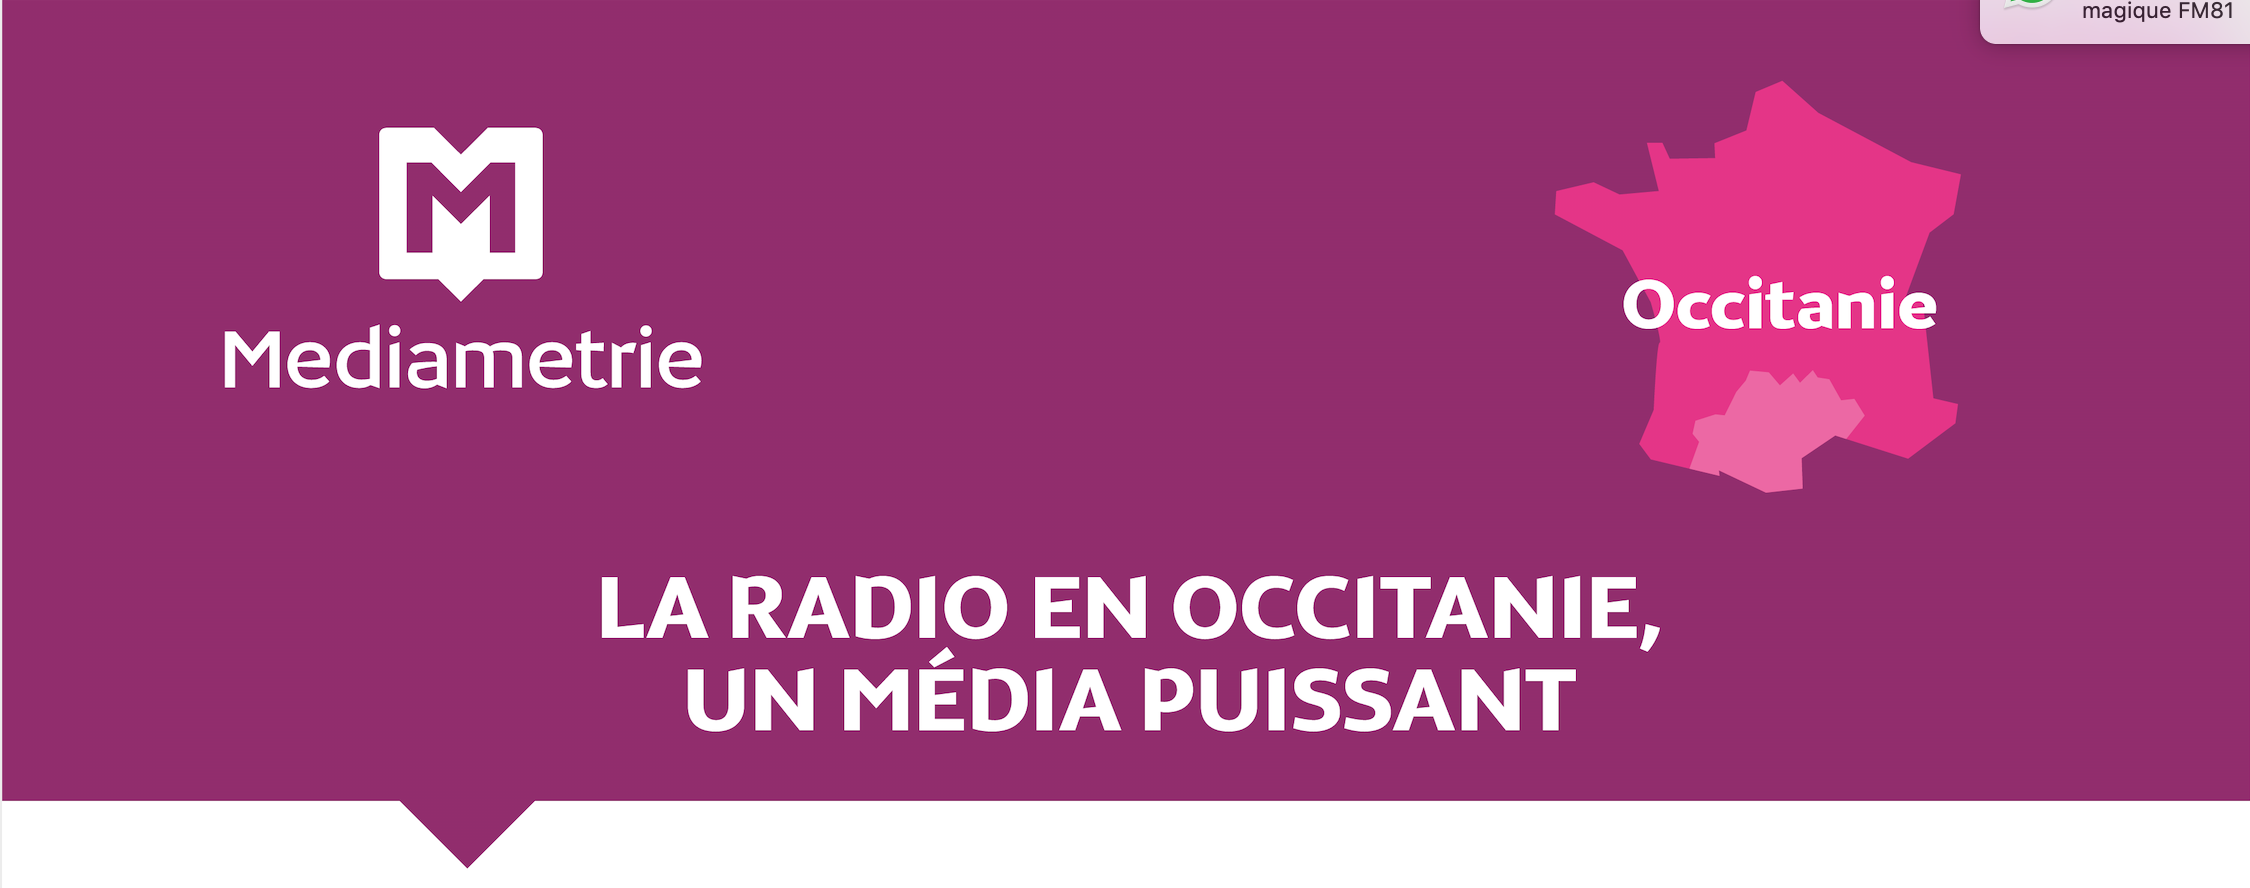 L'audience de la Radio en occitanie